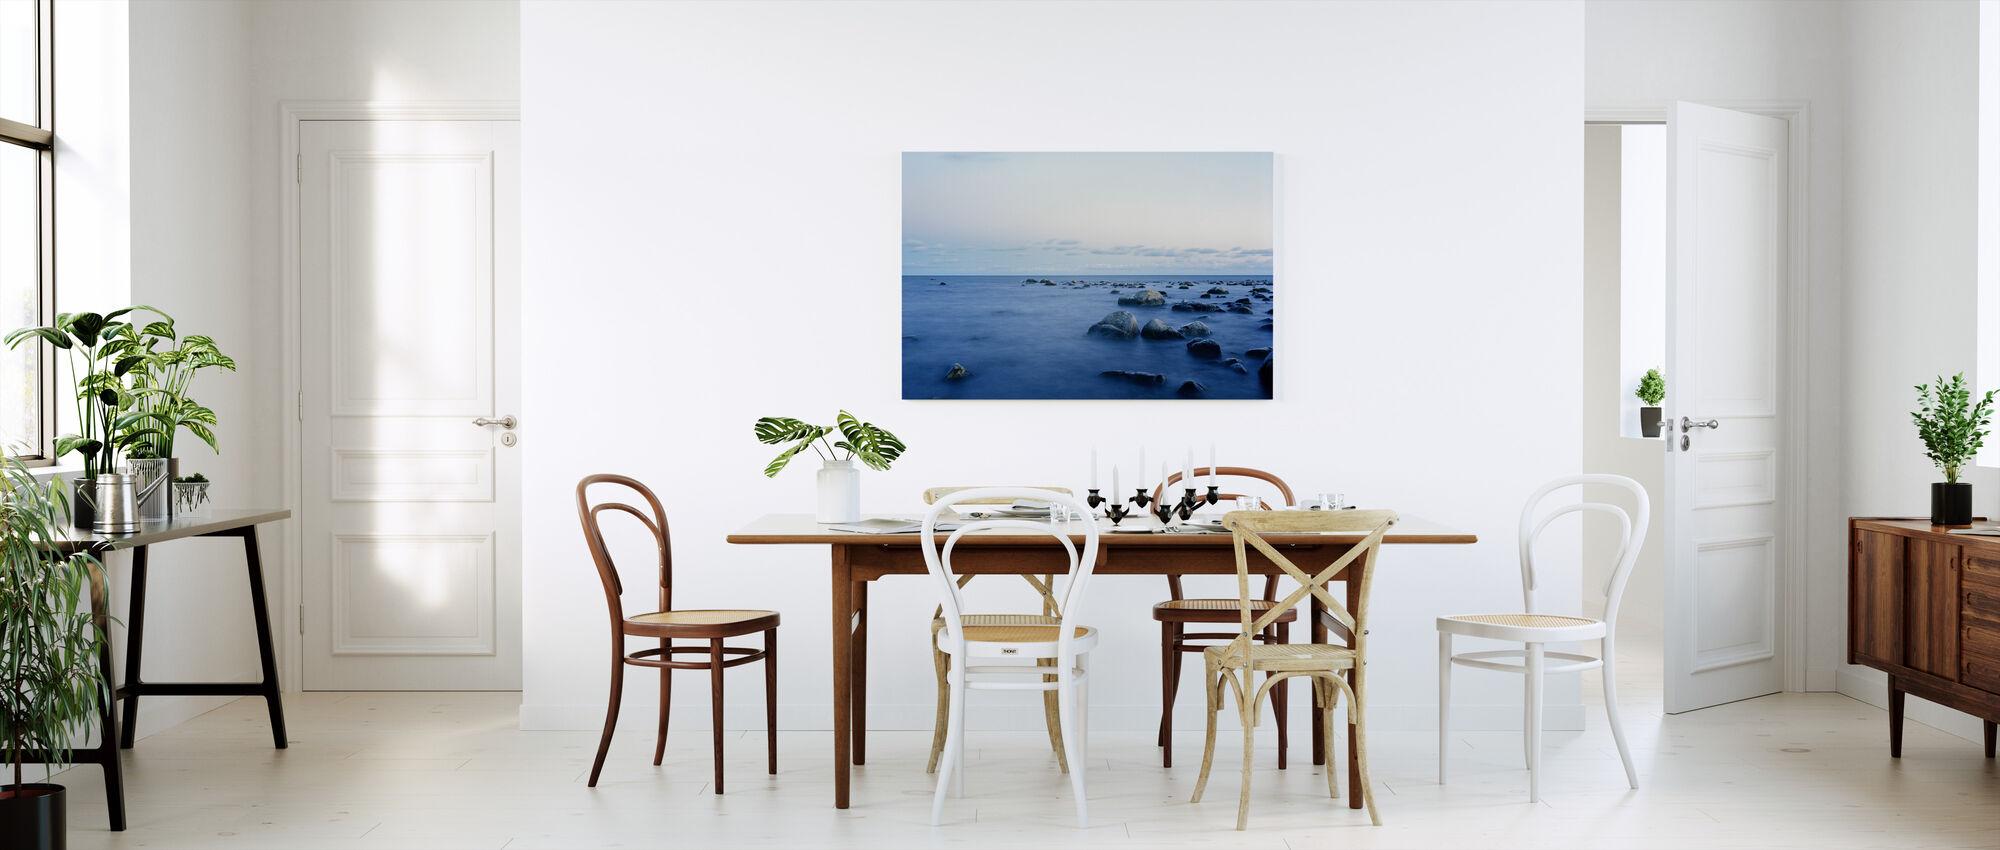 Torhamn Horizon - Canvastaulu - Keittiö